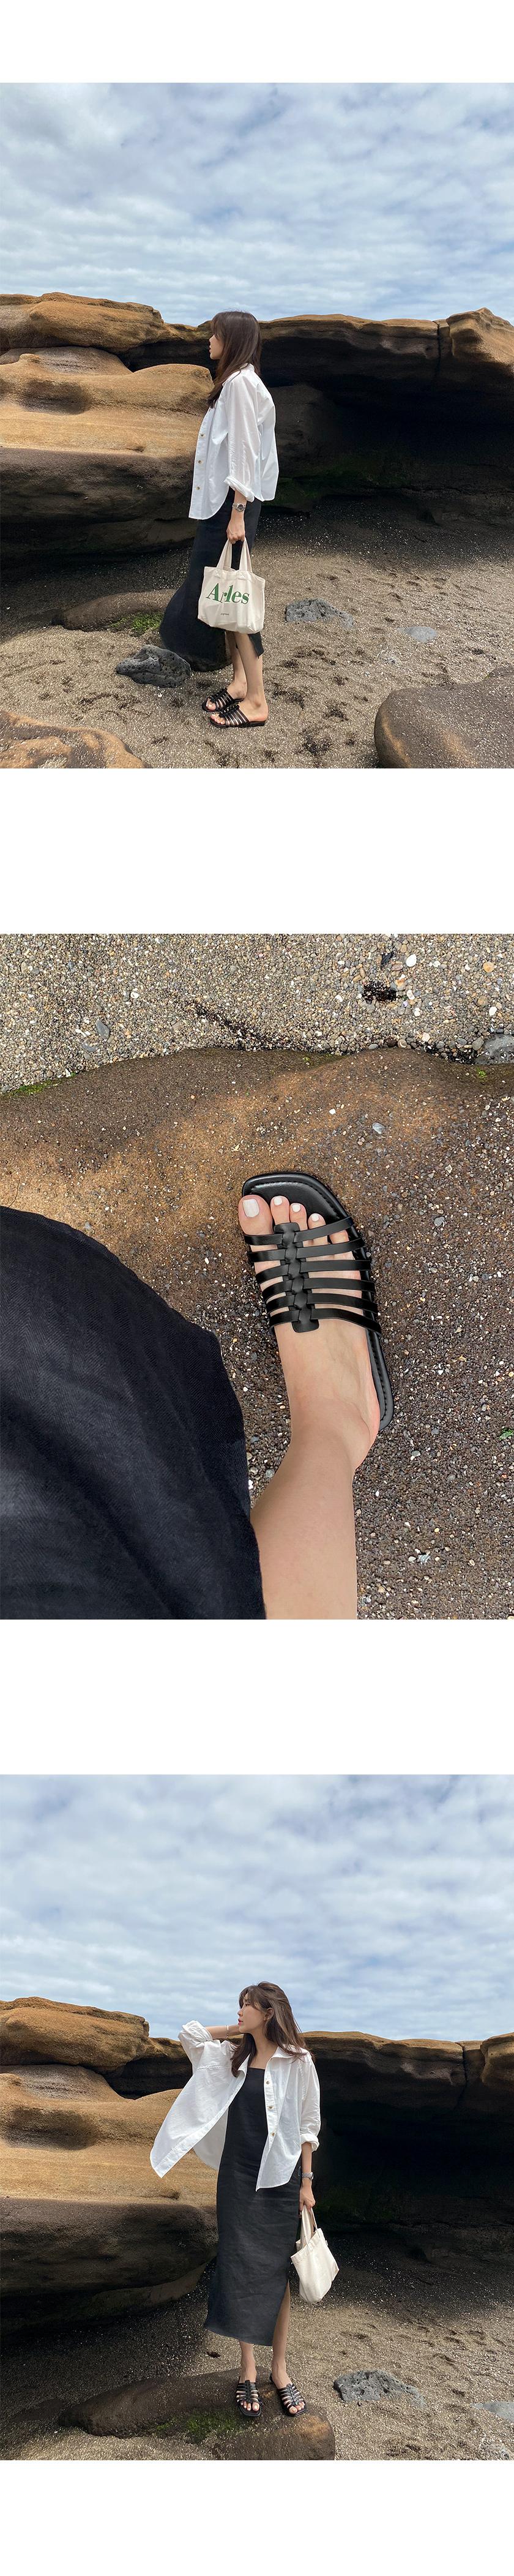 Arose strap slippers